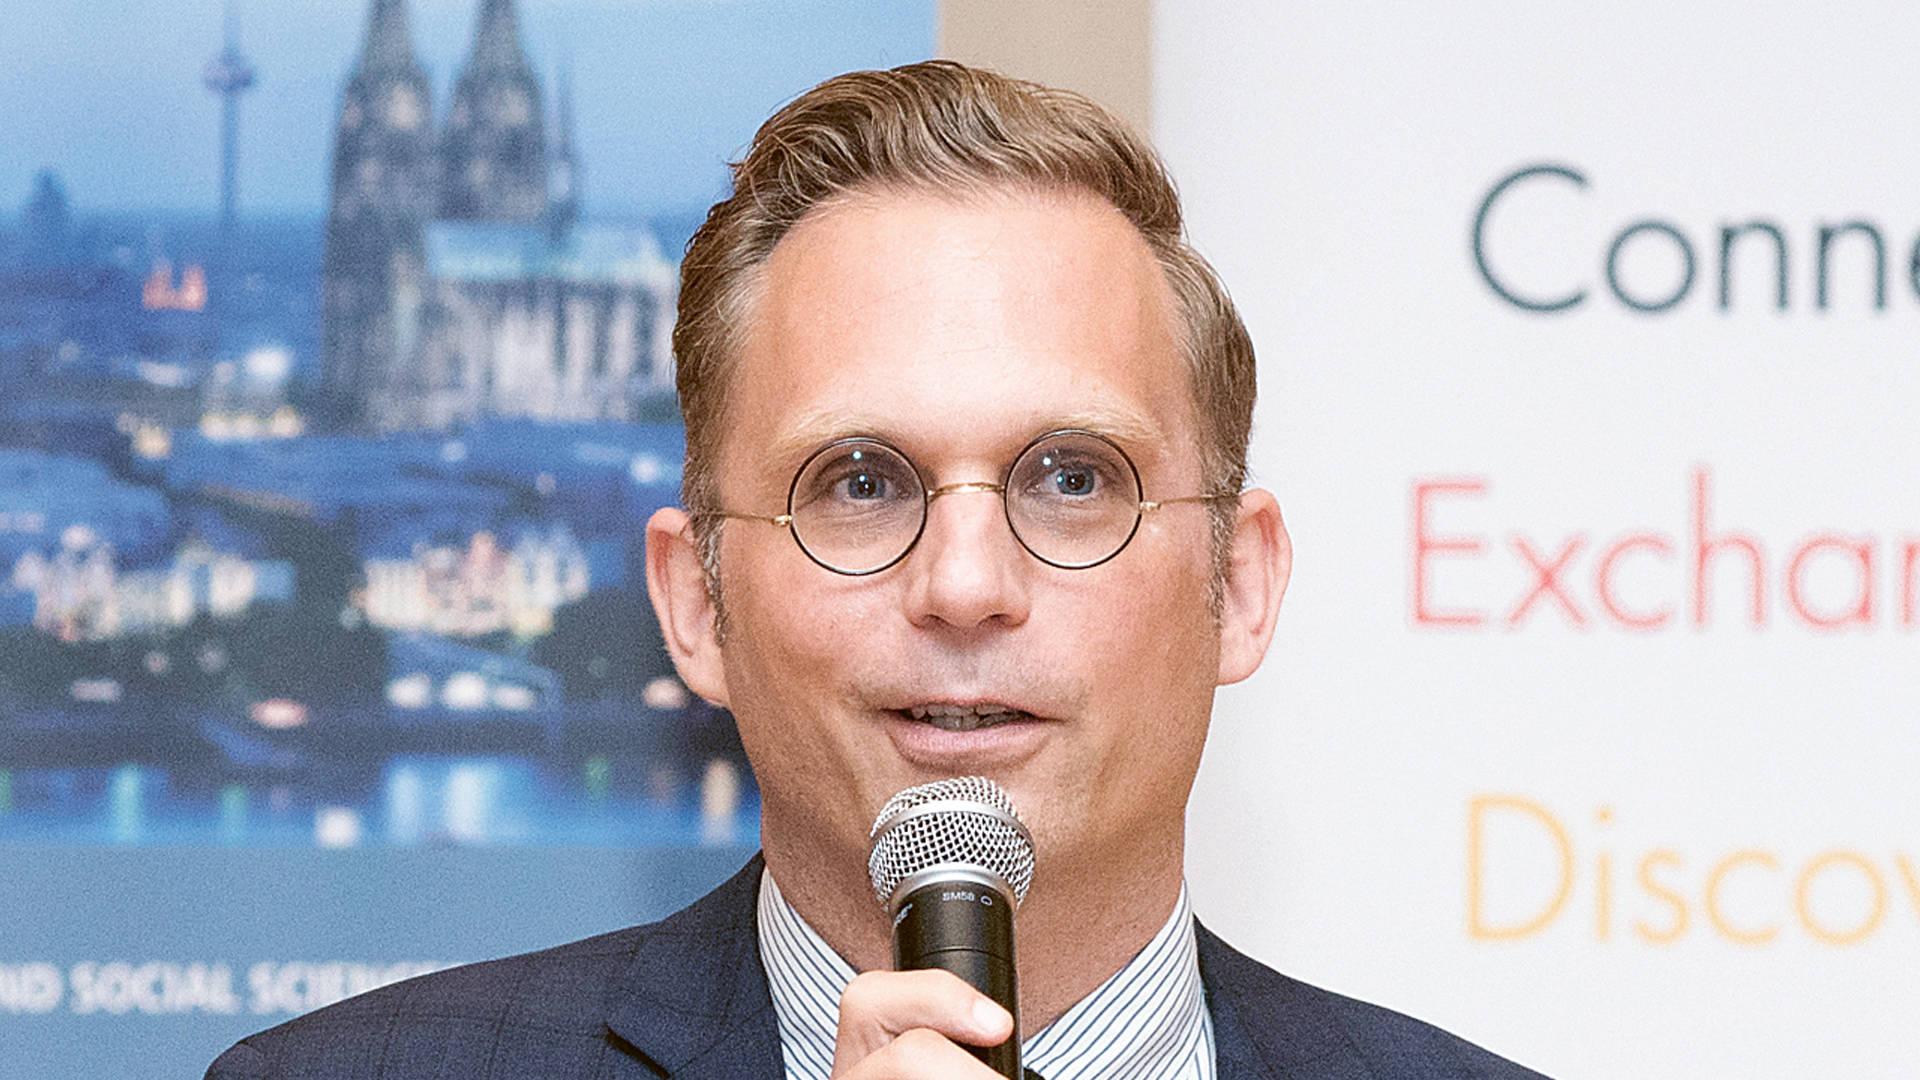 Gerrit Rössler, Programme Manager of the DWIH New York